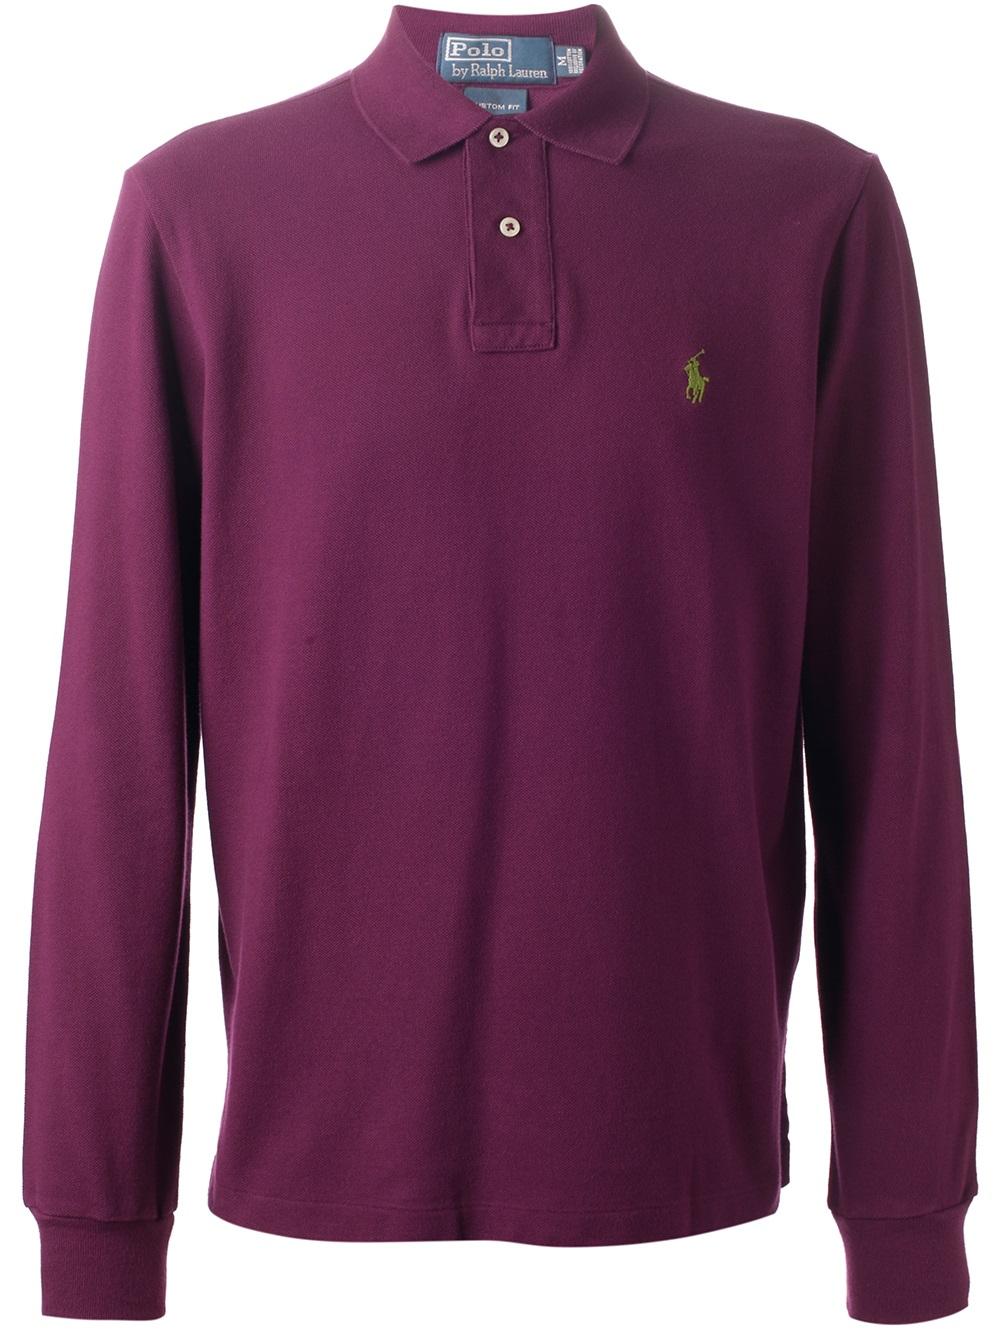 Polo ralph lauren cotton long sleeve custom fit polo shirt for Long sleeve purple polo shirt